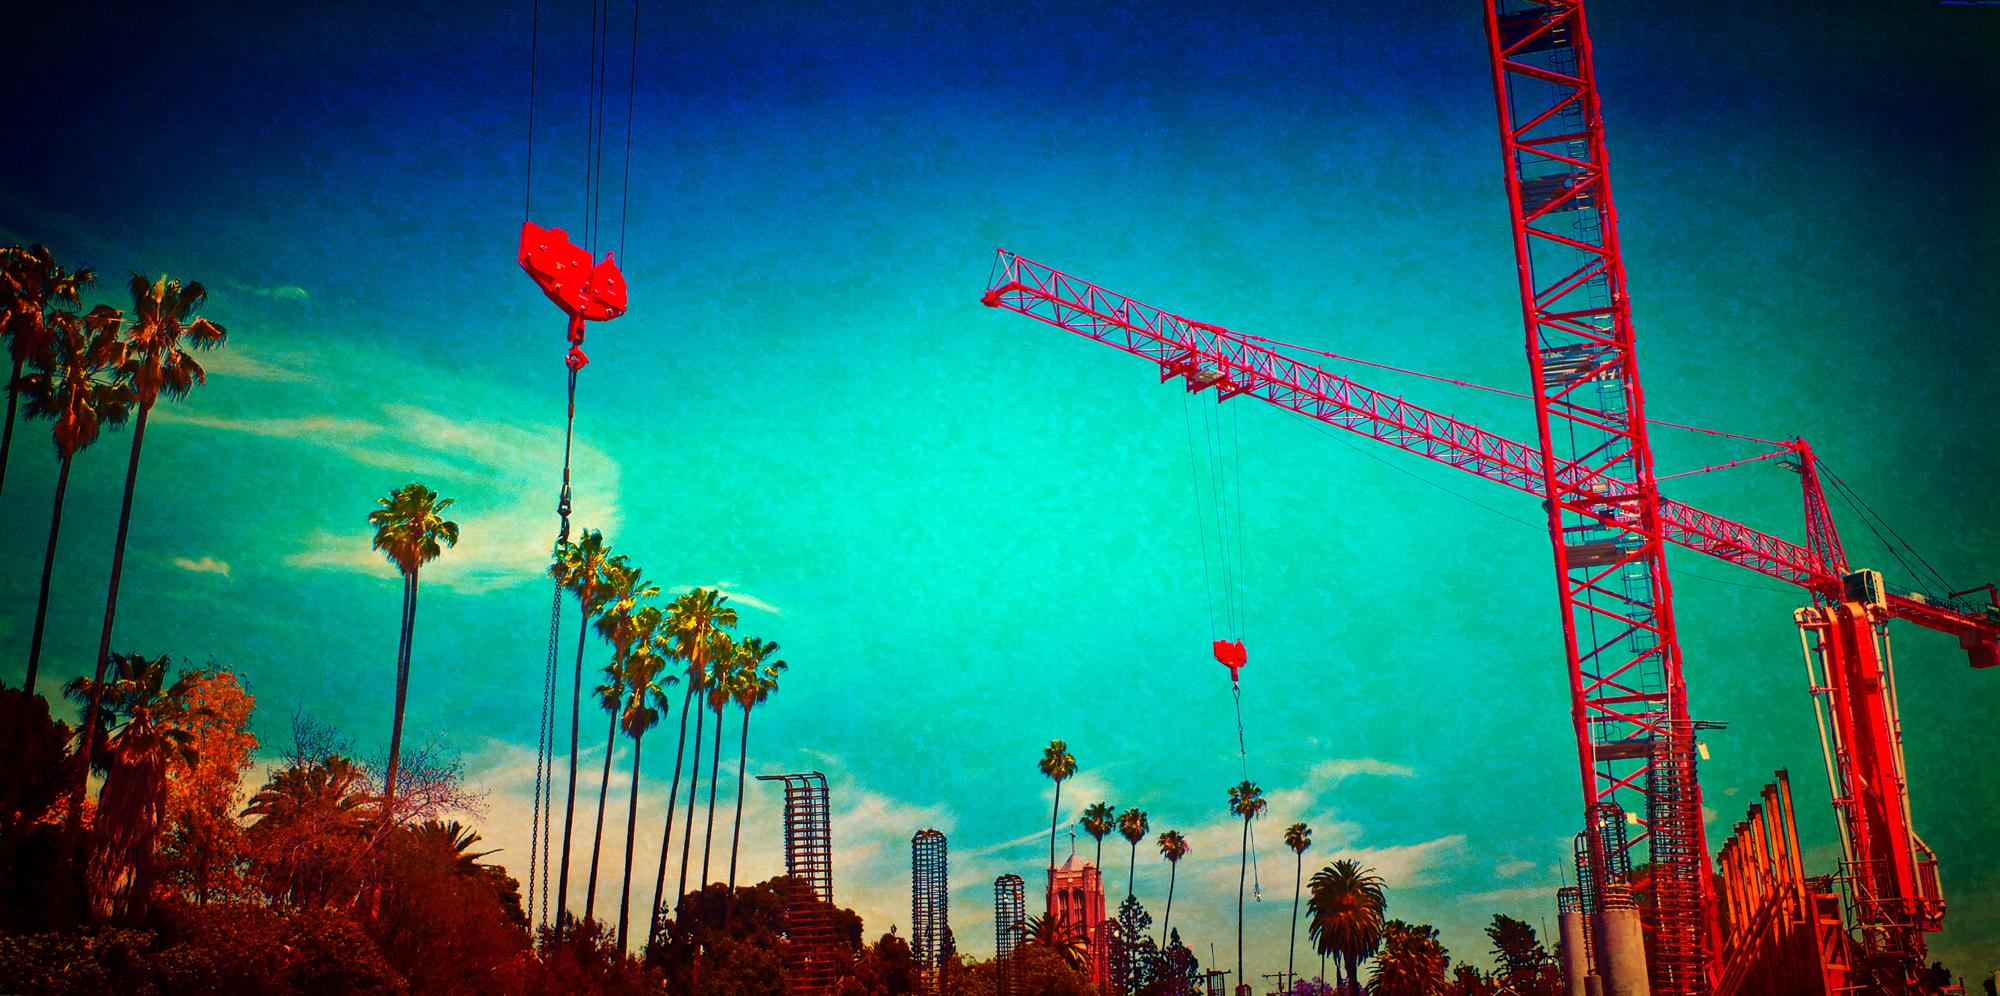 cranes_palms_old.jpg